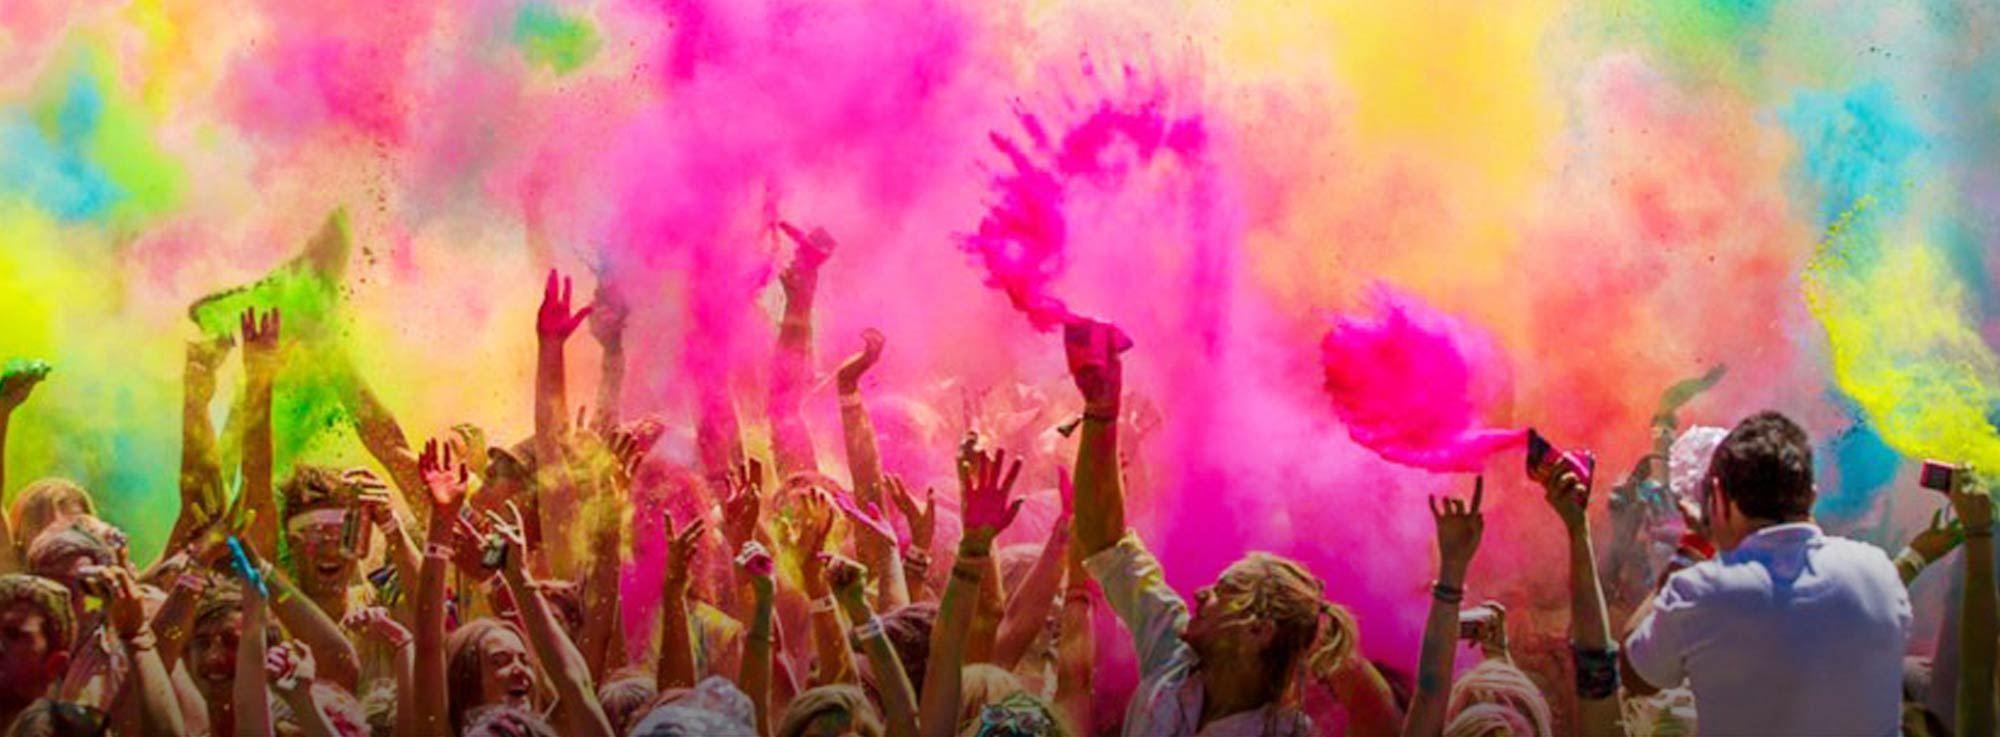 Ceglie Messapica: Holi Splash Festival